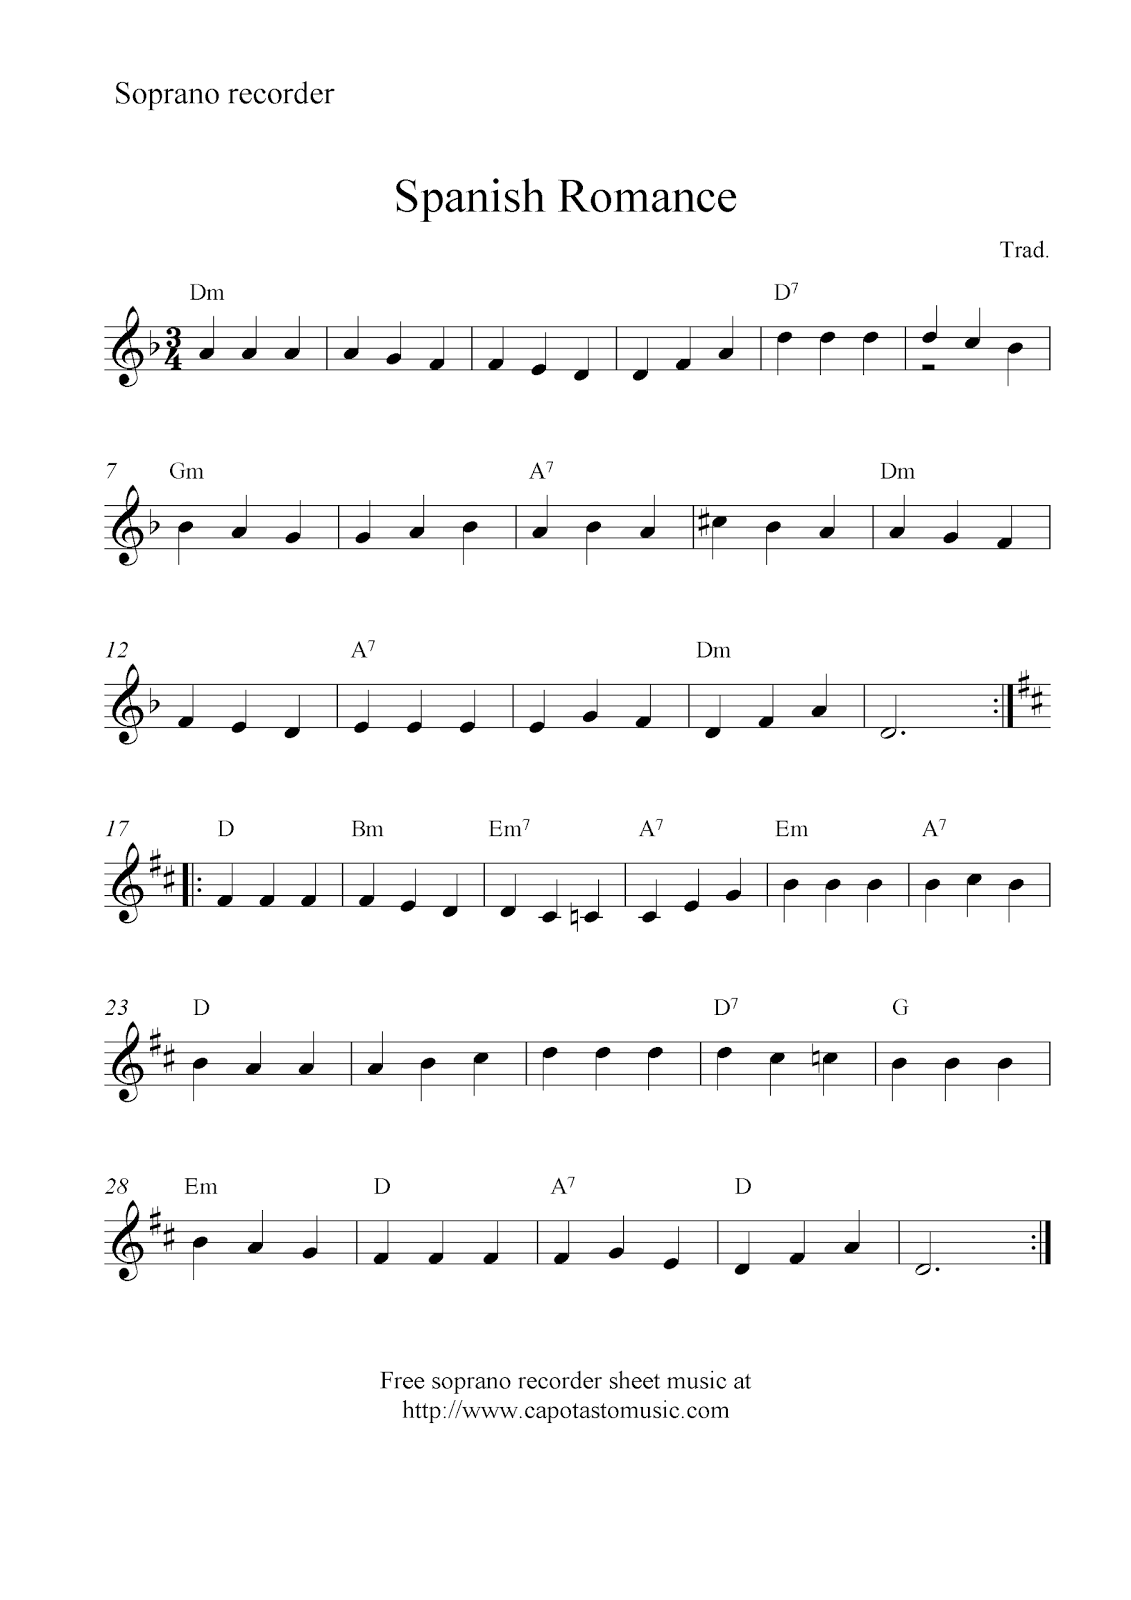 Spanish romance free soprano recorder sheet music notes